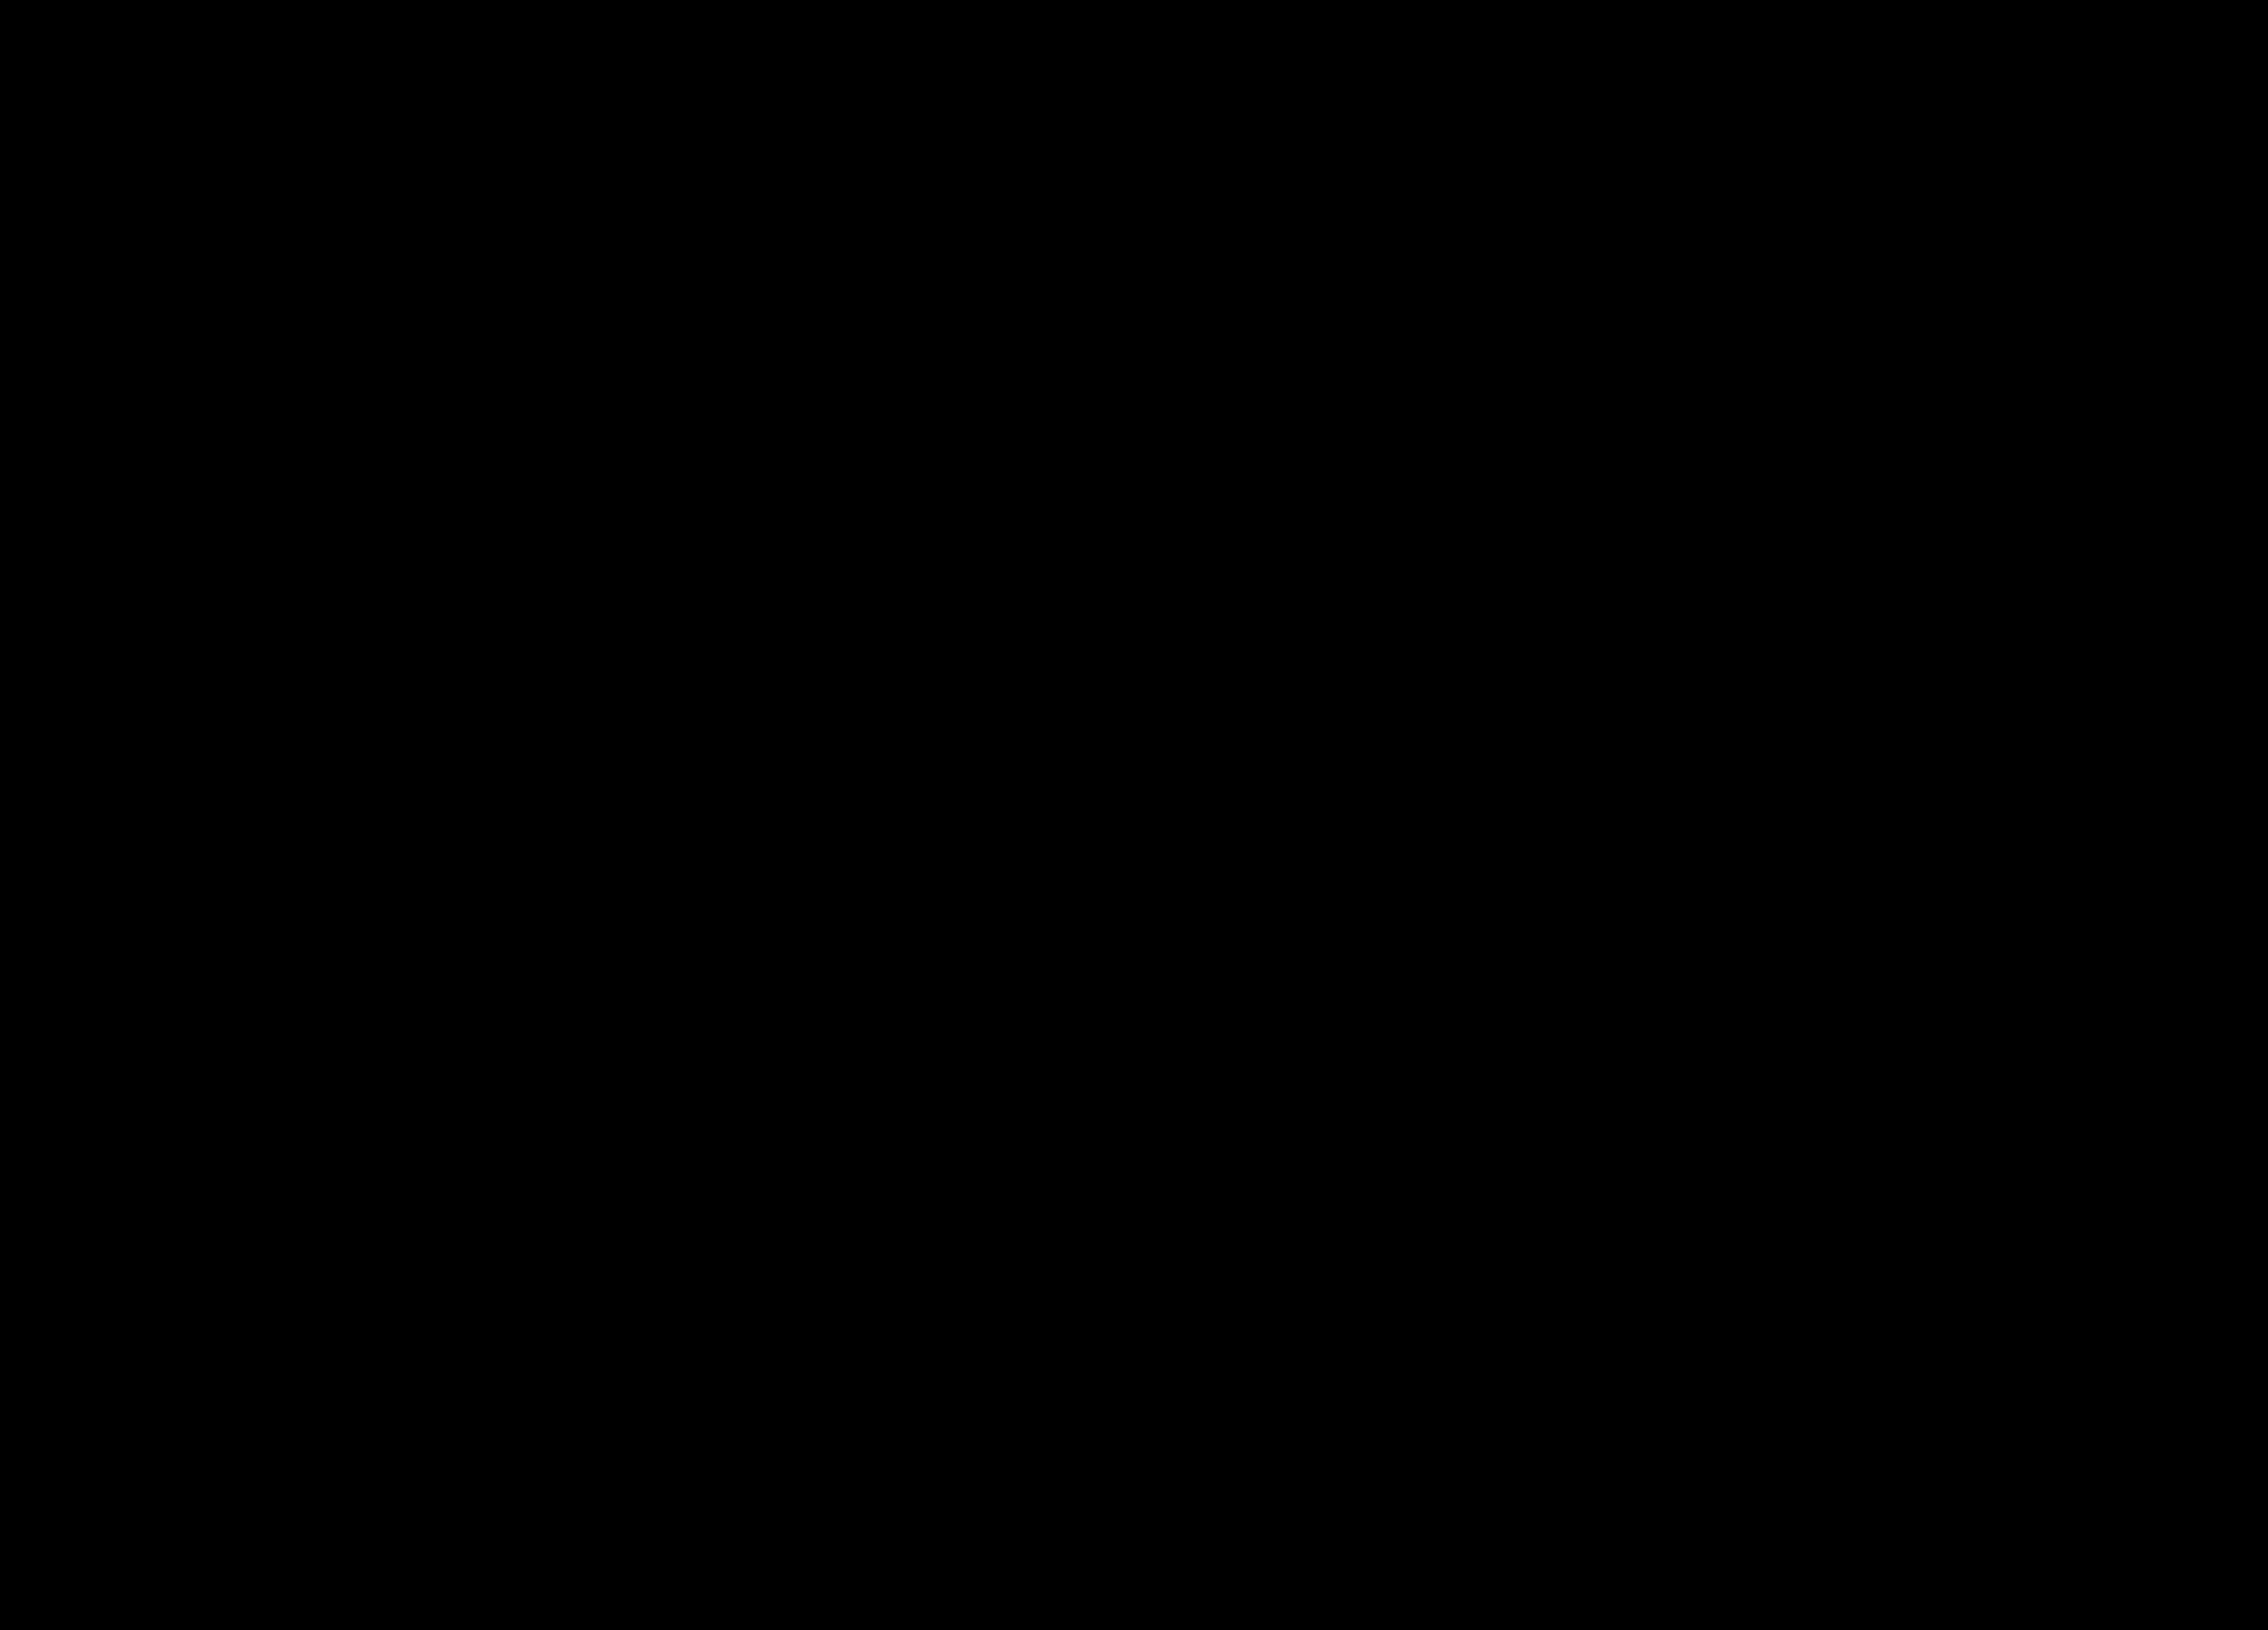 Revolutionary, Impactful Script Style Logo Design